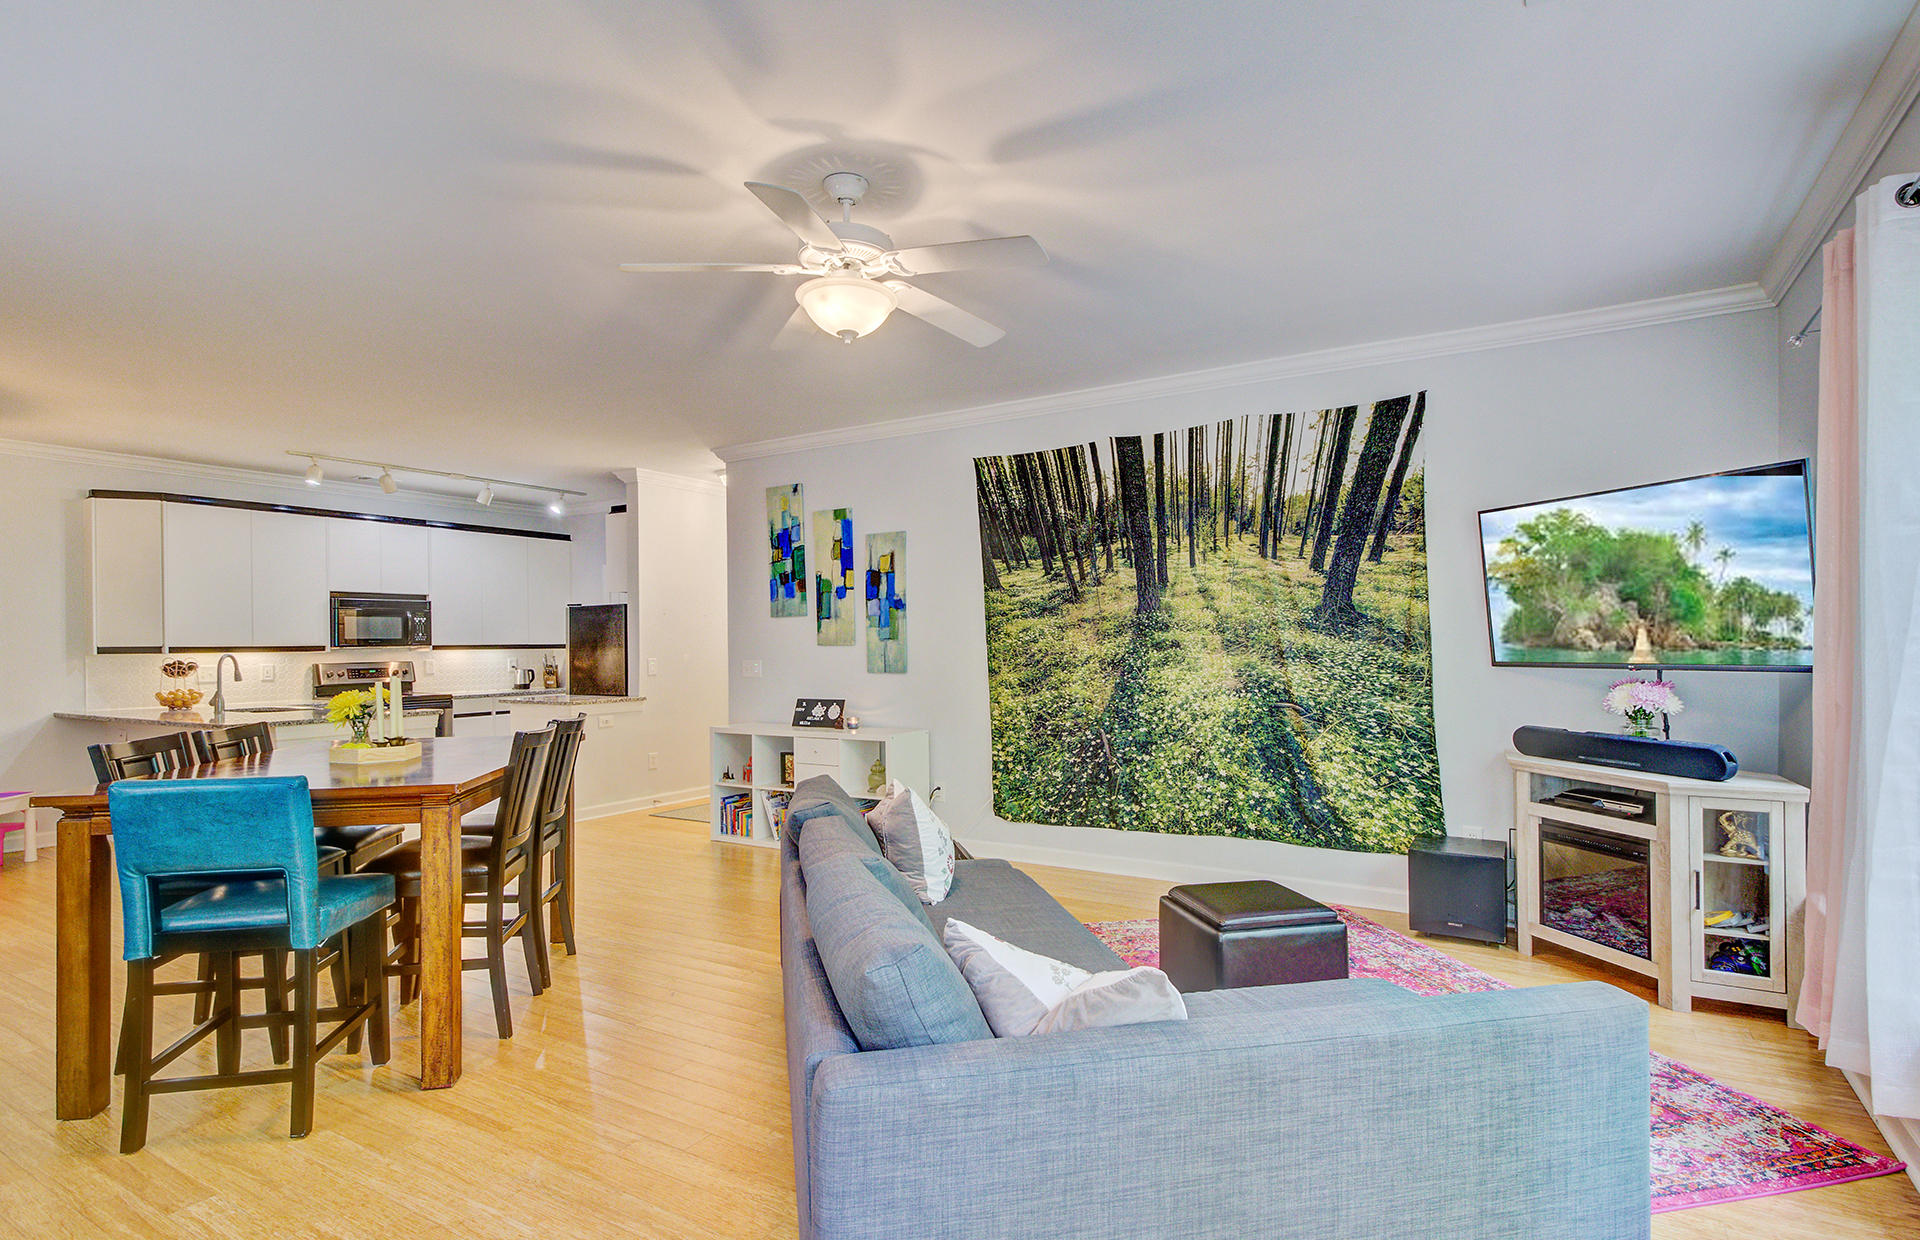 Dunes West Homes For Sale - 1566 Oxborough, Mount Pleasant, SC - 30